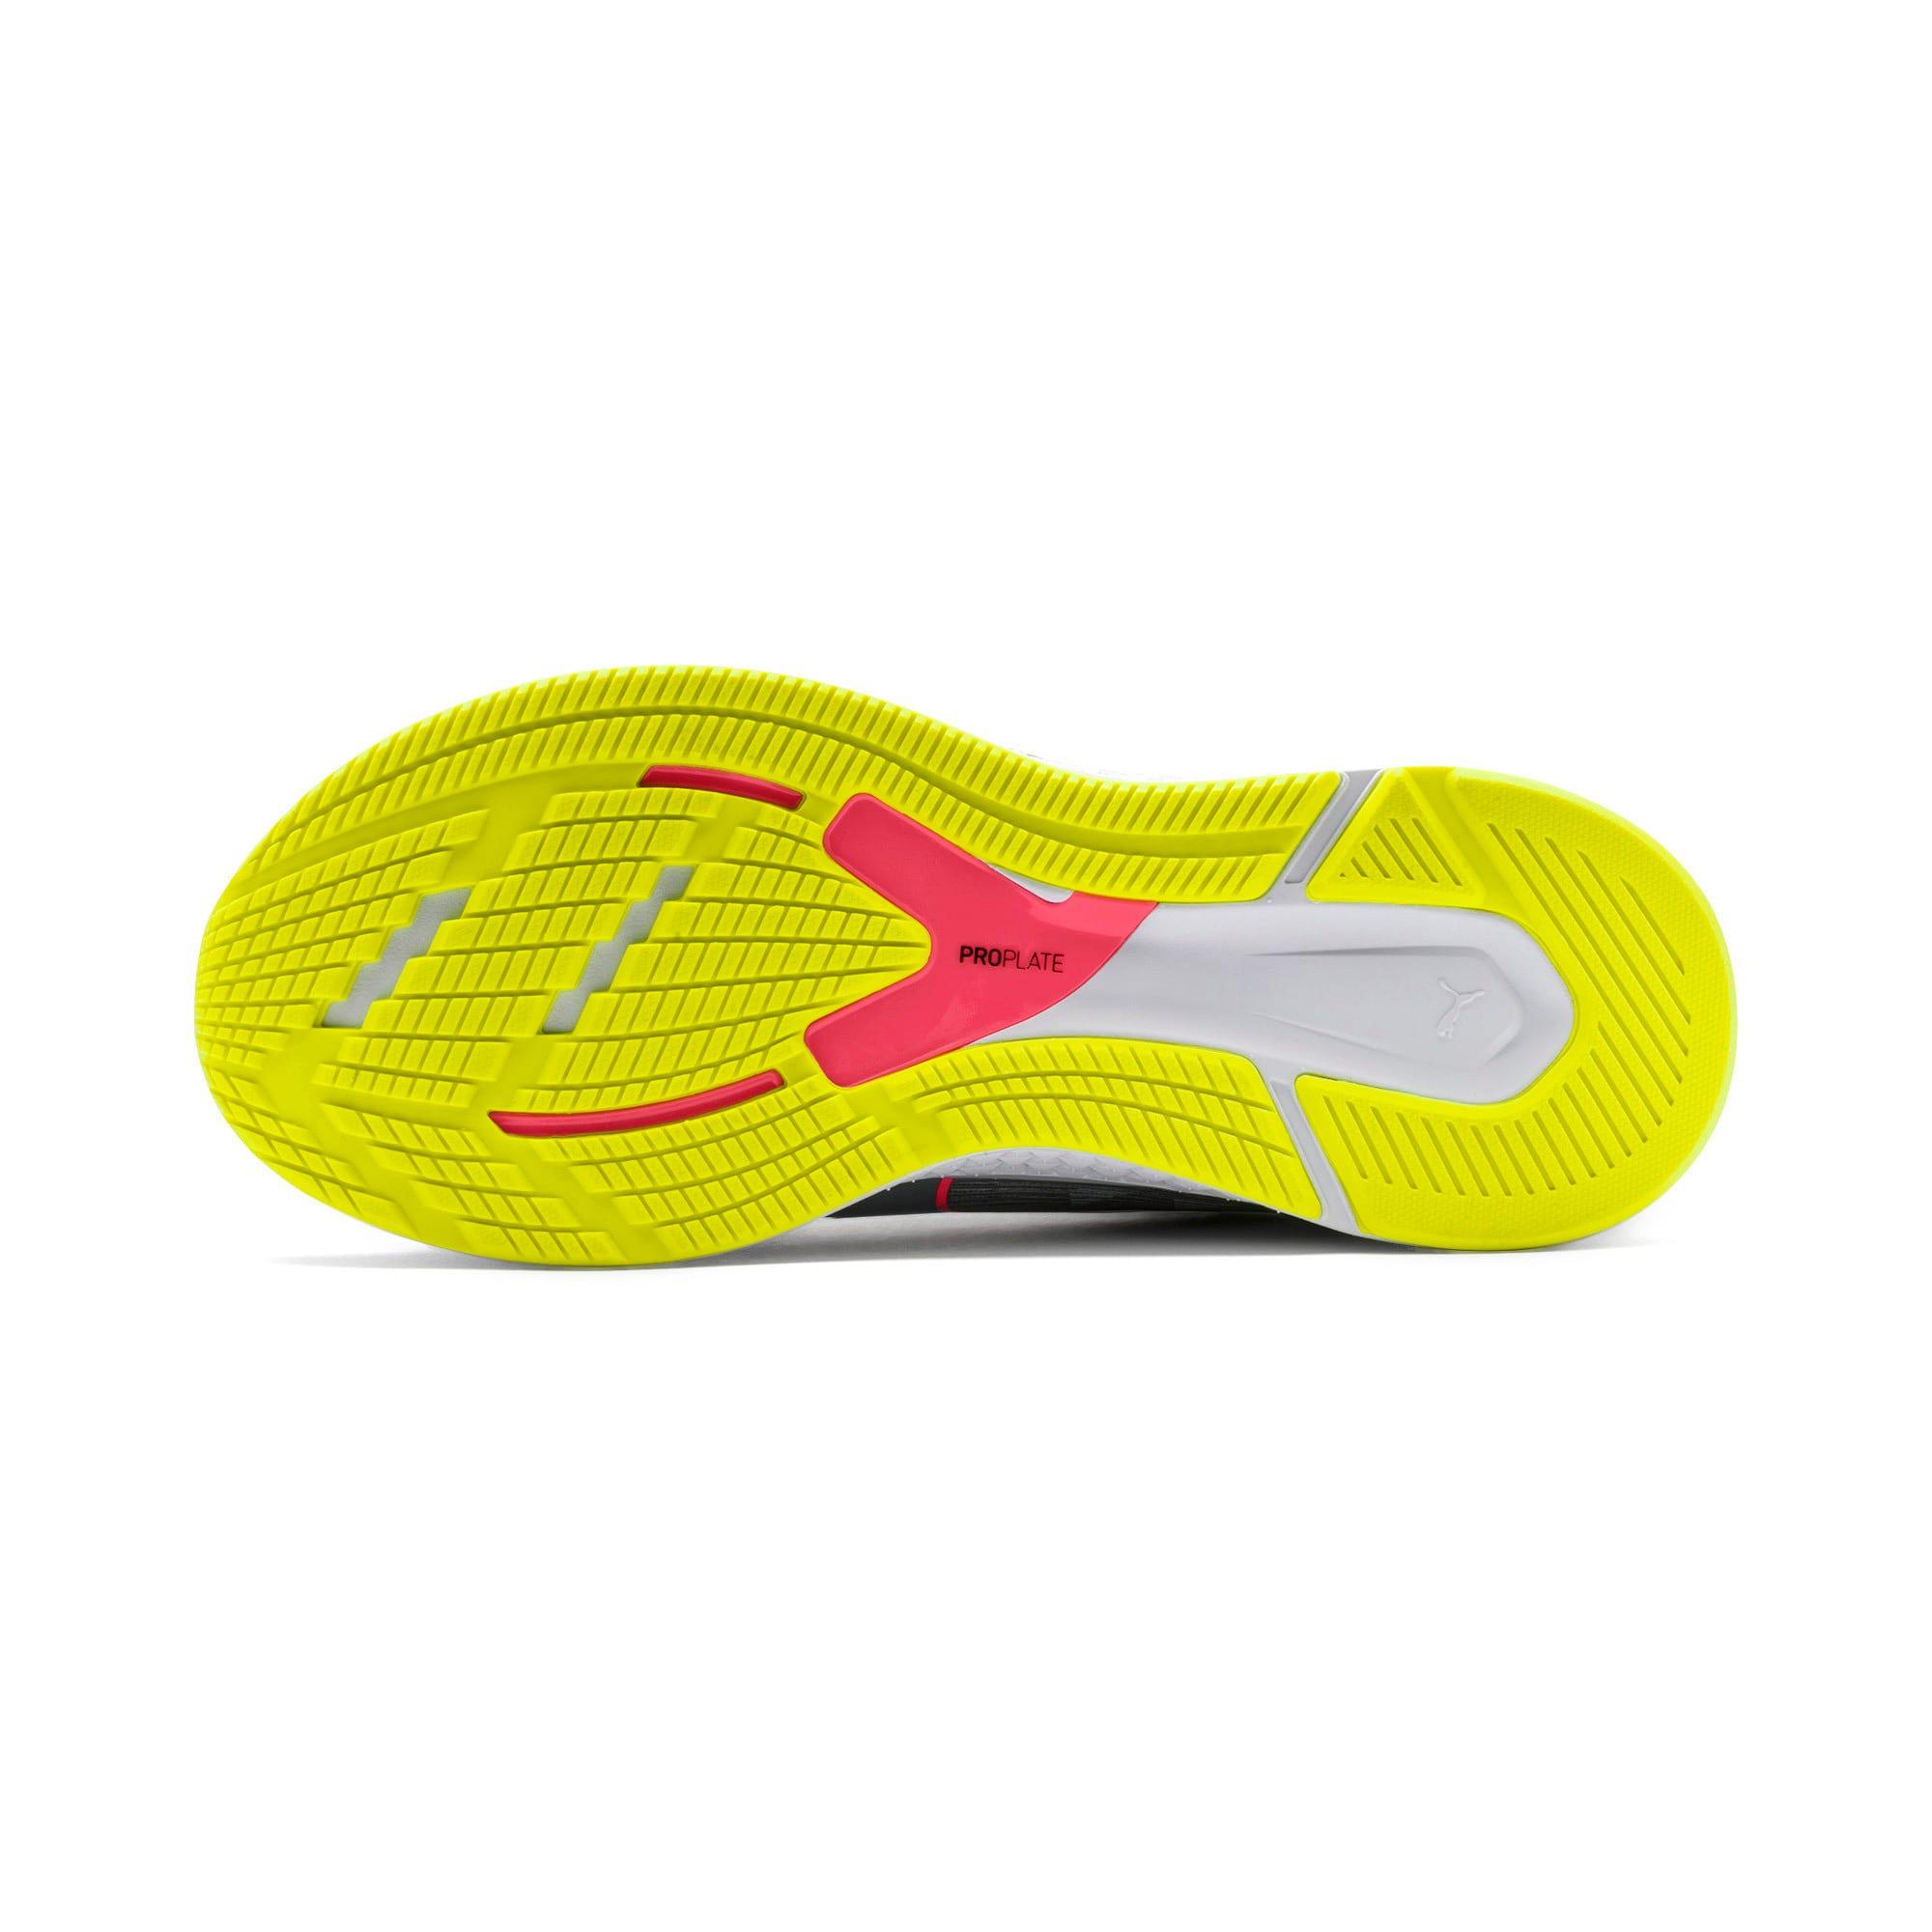 Imagen en miniatura 5 de Zapatillas de running de mujer Speed Sutamina, Quarry-Yellow Alert-Pink, mediana